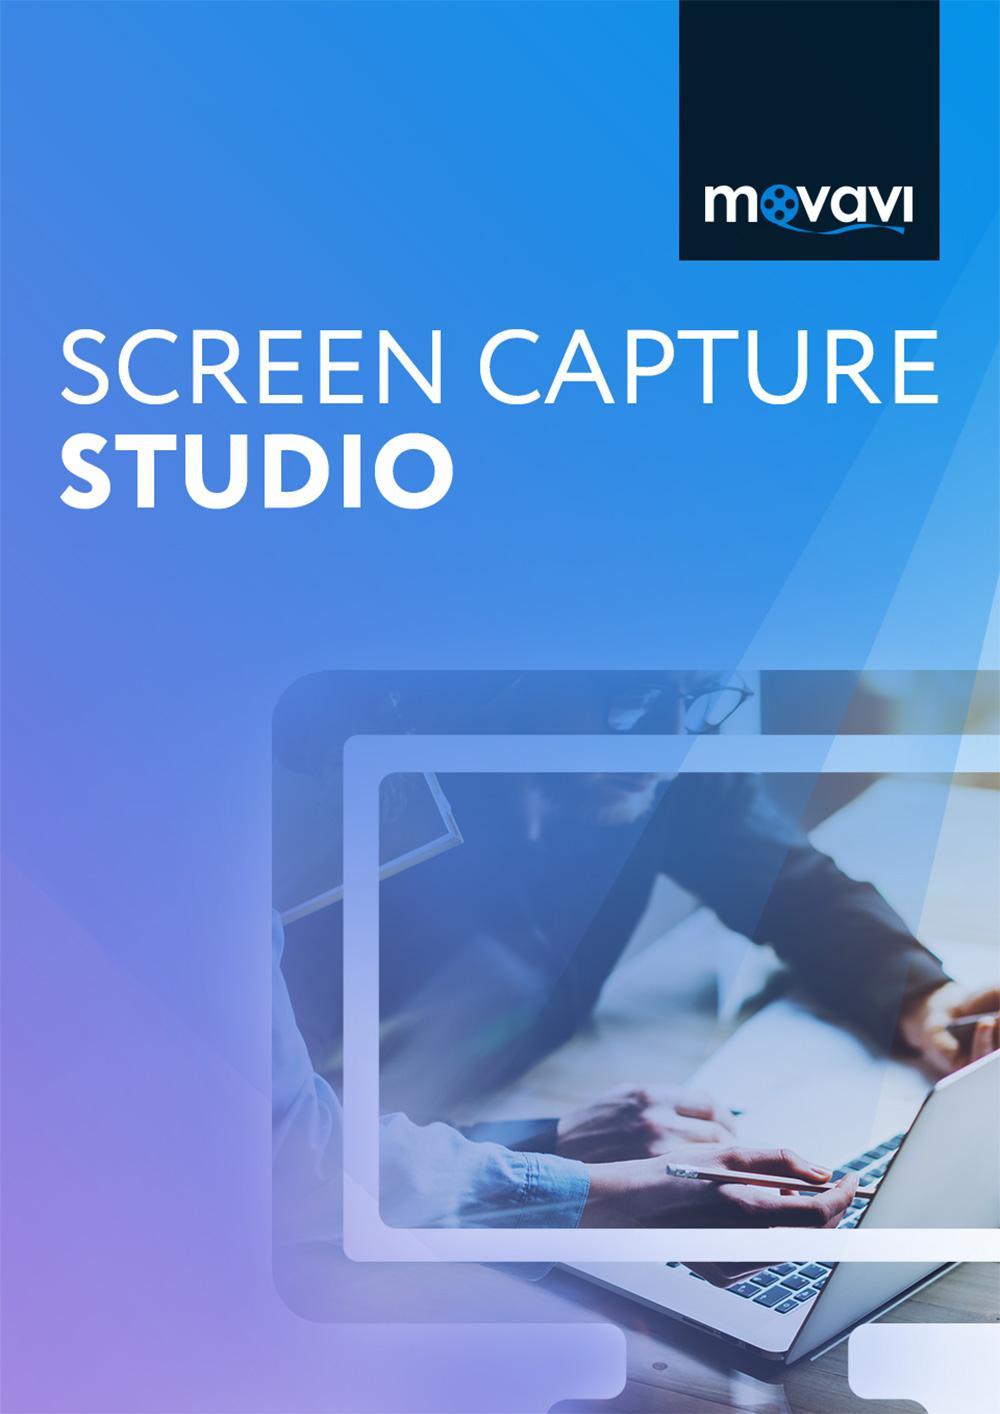 Movavi Screen Capture & Video Editor 9 Personal Edition [Download] by Movavi